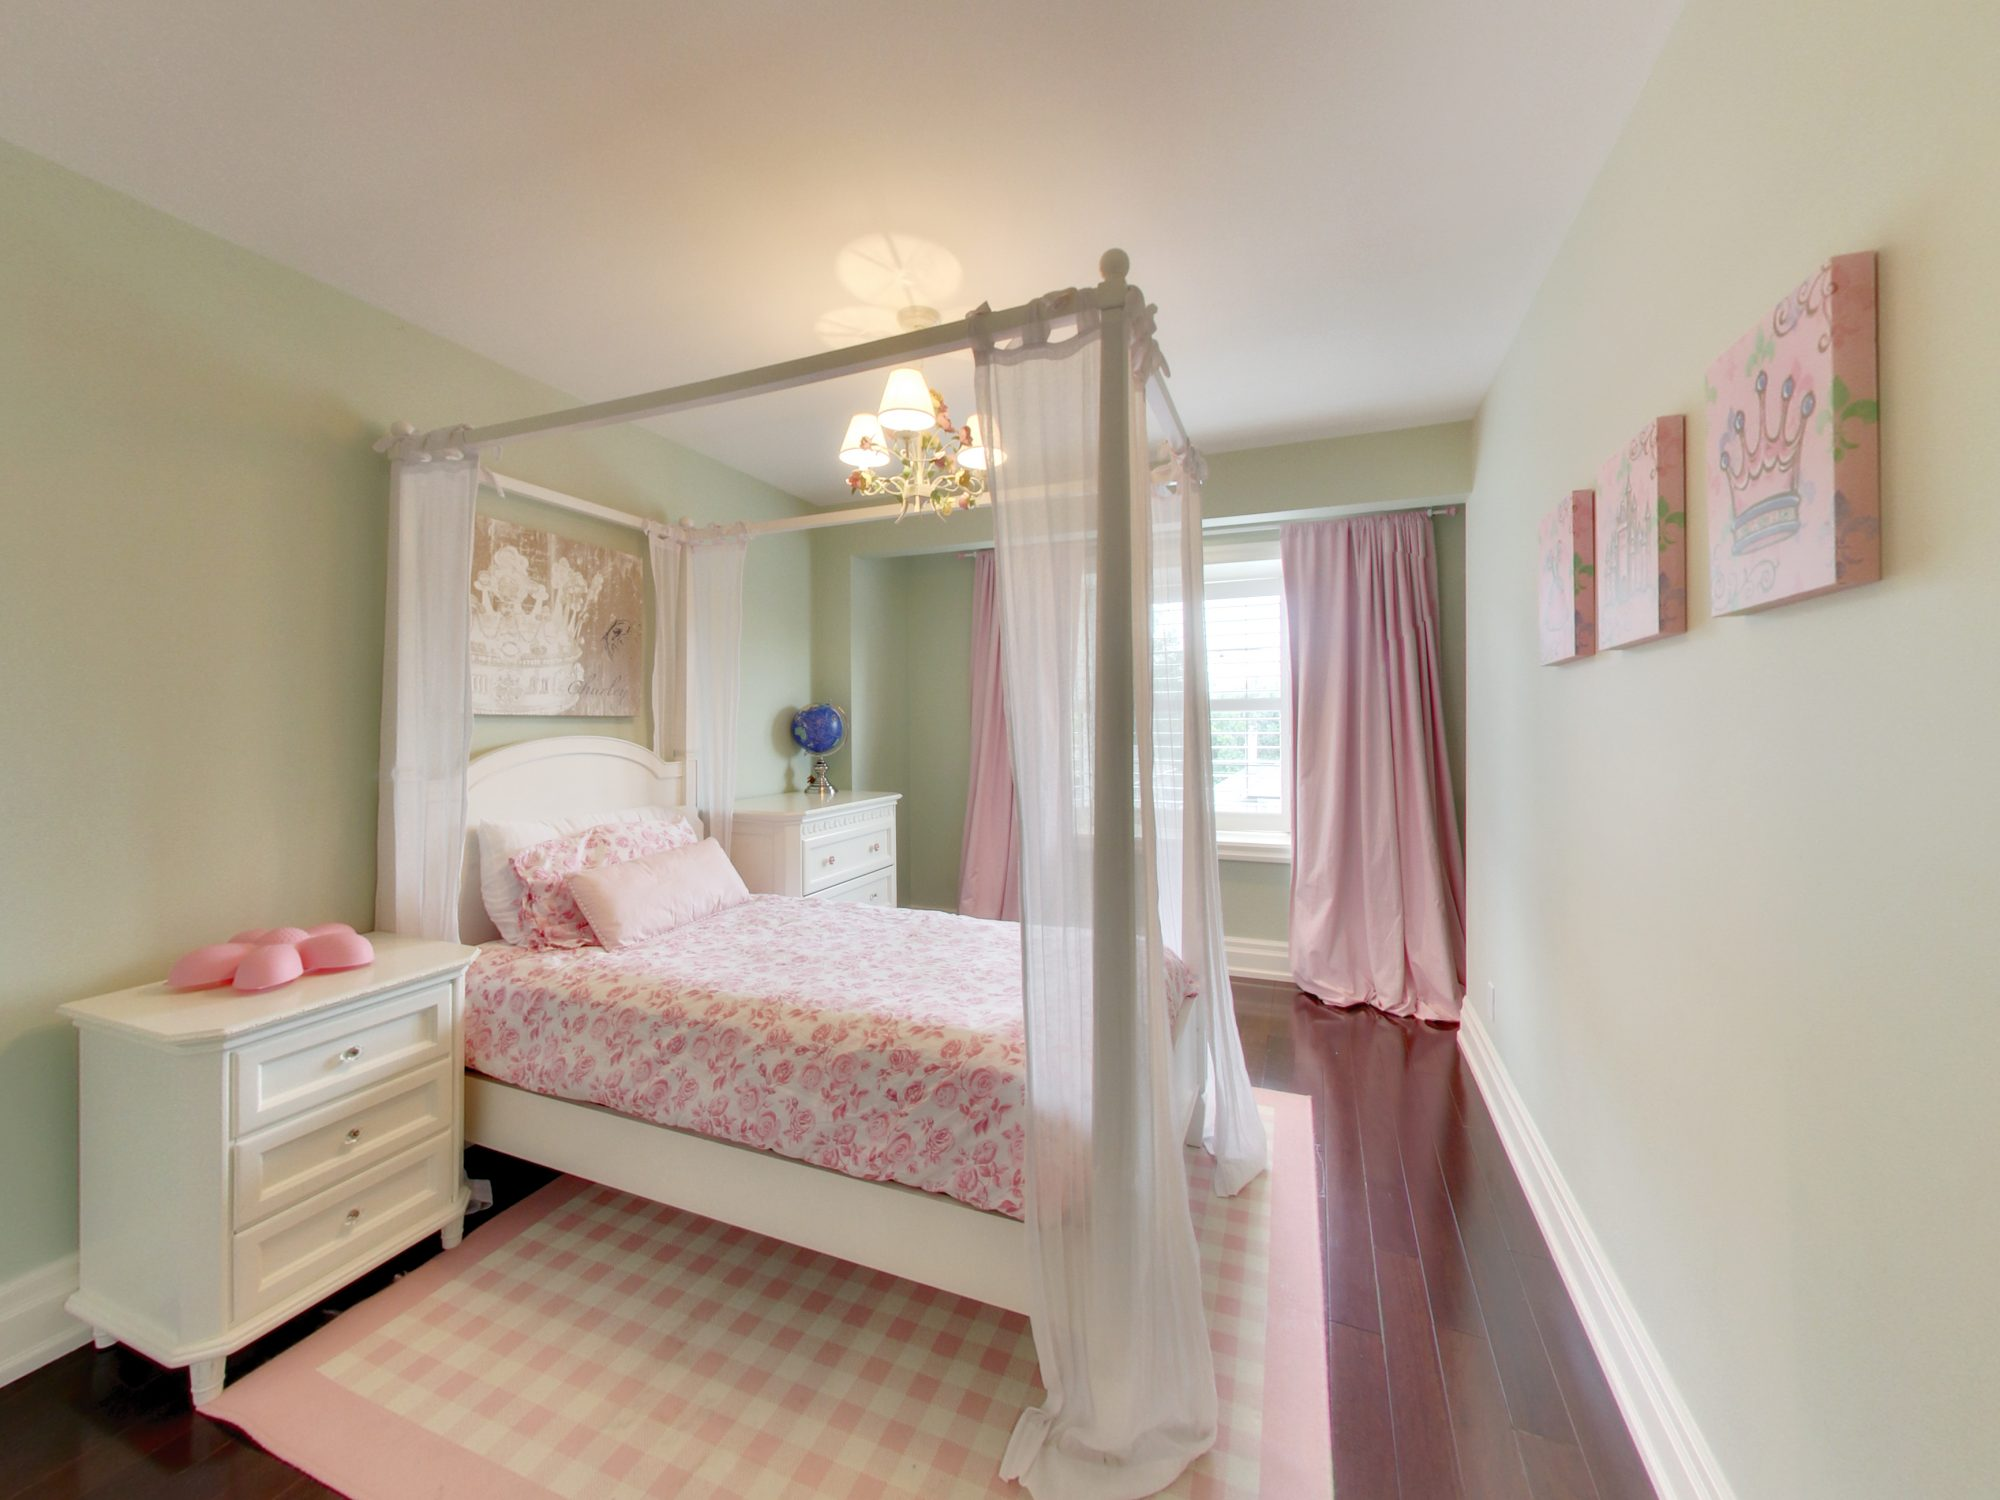 toronto-house-for-sale-15-shand-avenue-8